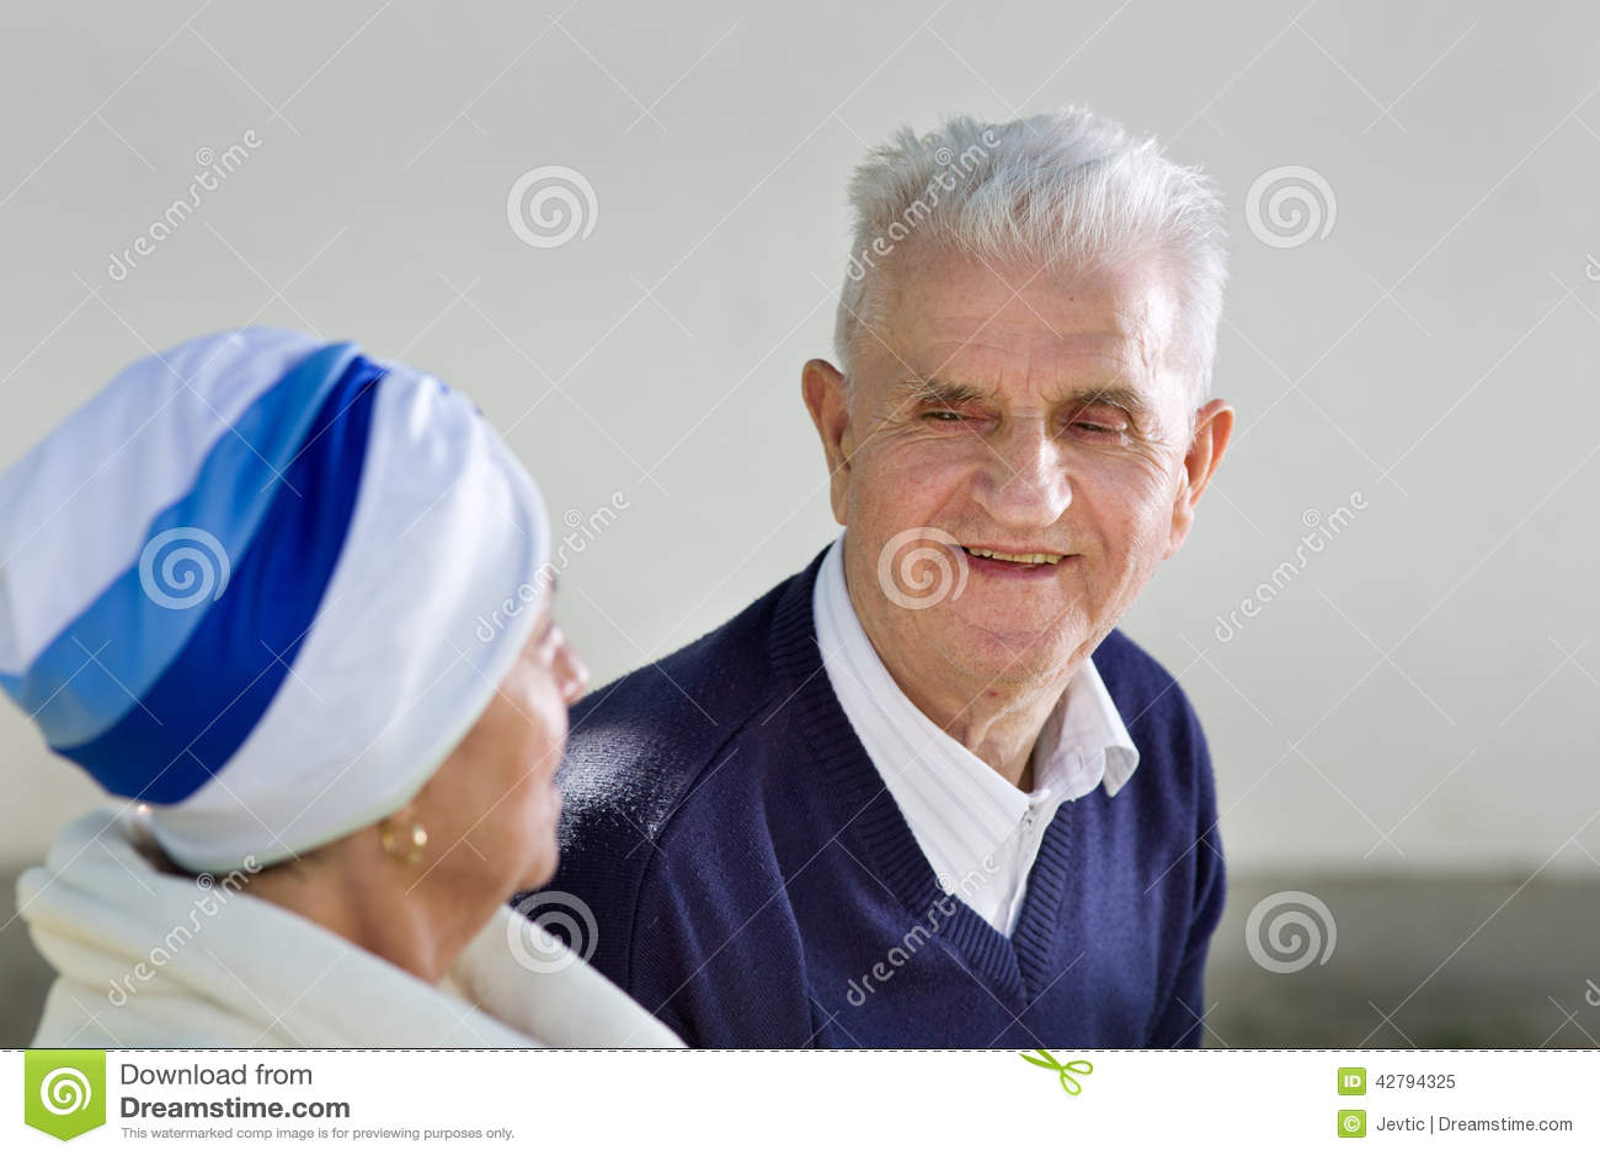 Chat with older men